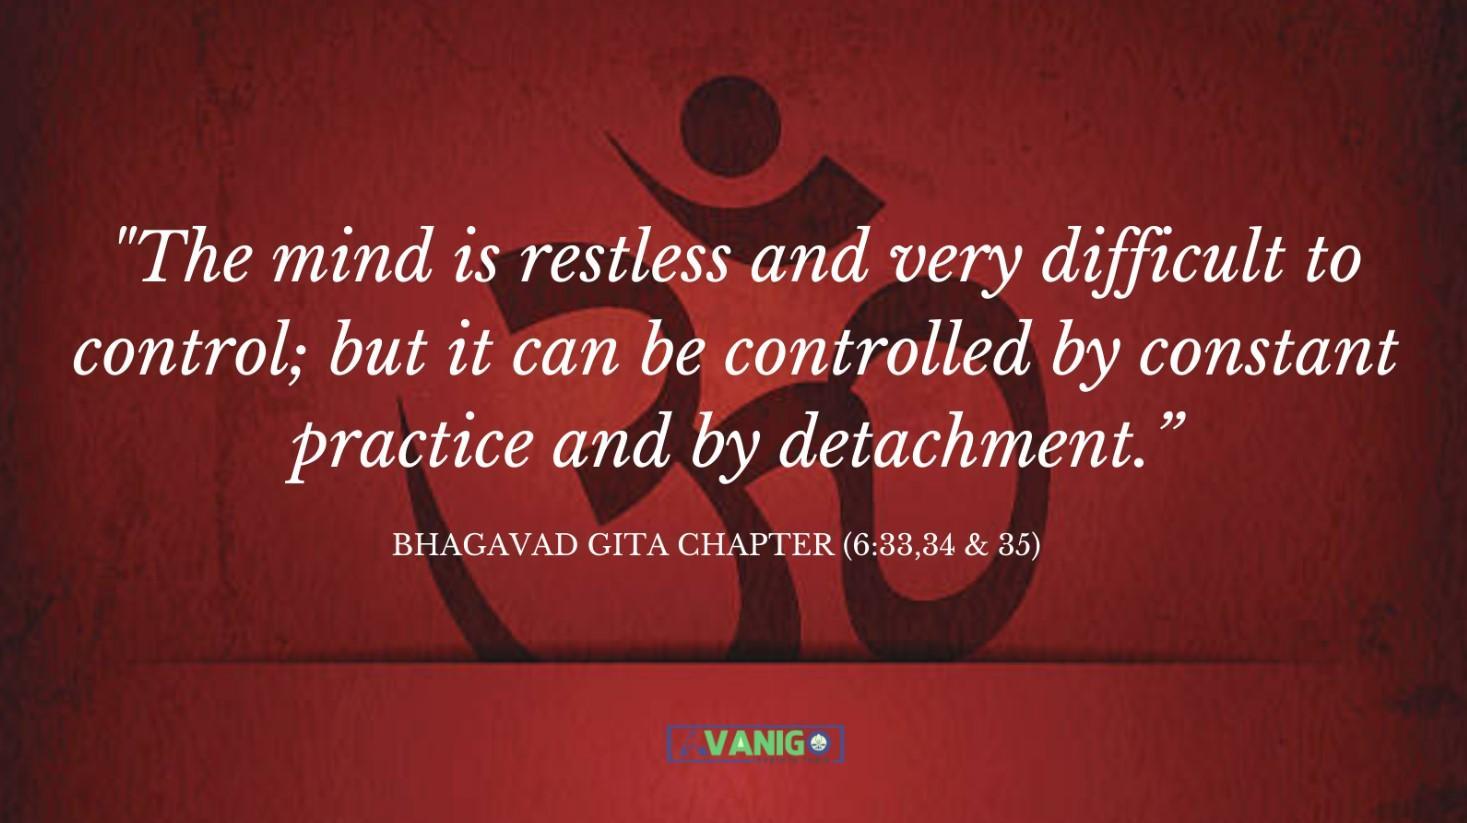 Bhagvad Gita Chapter 6:33,34 & 35